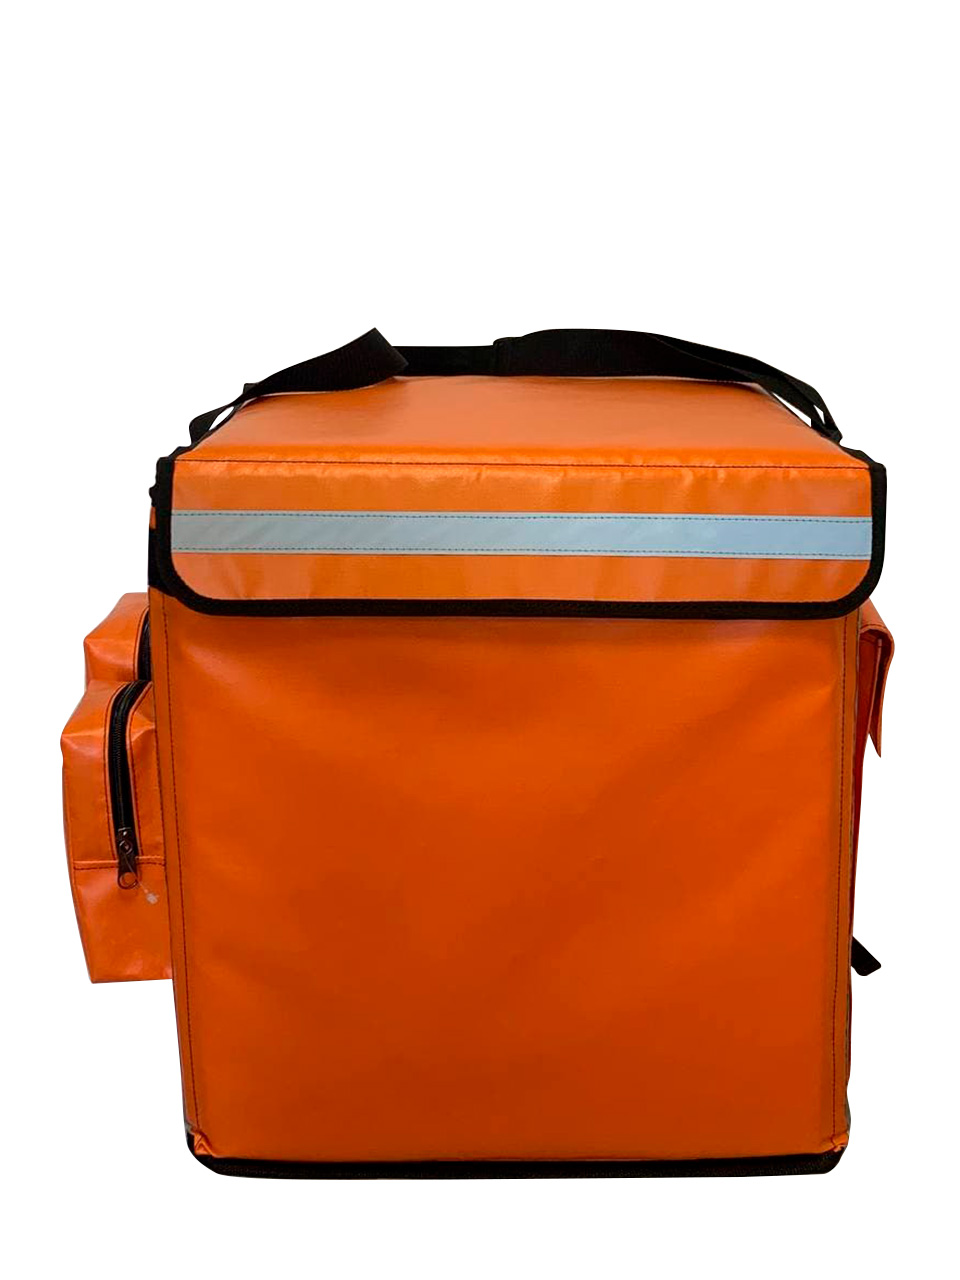 orange-bag-2